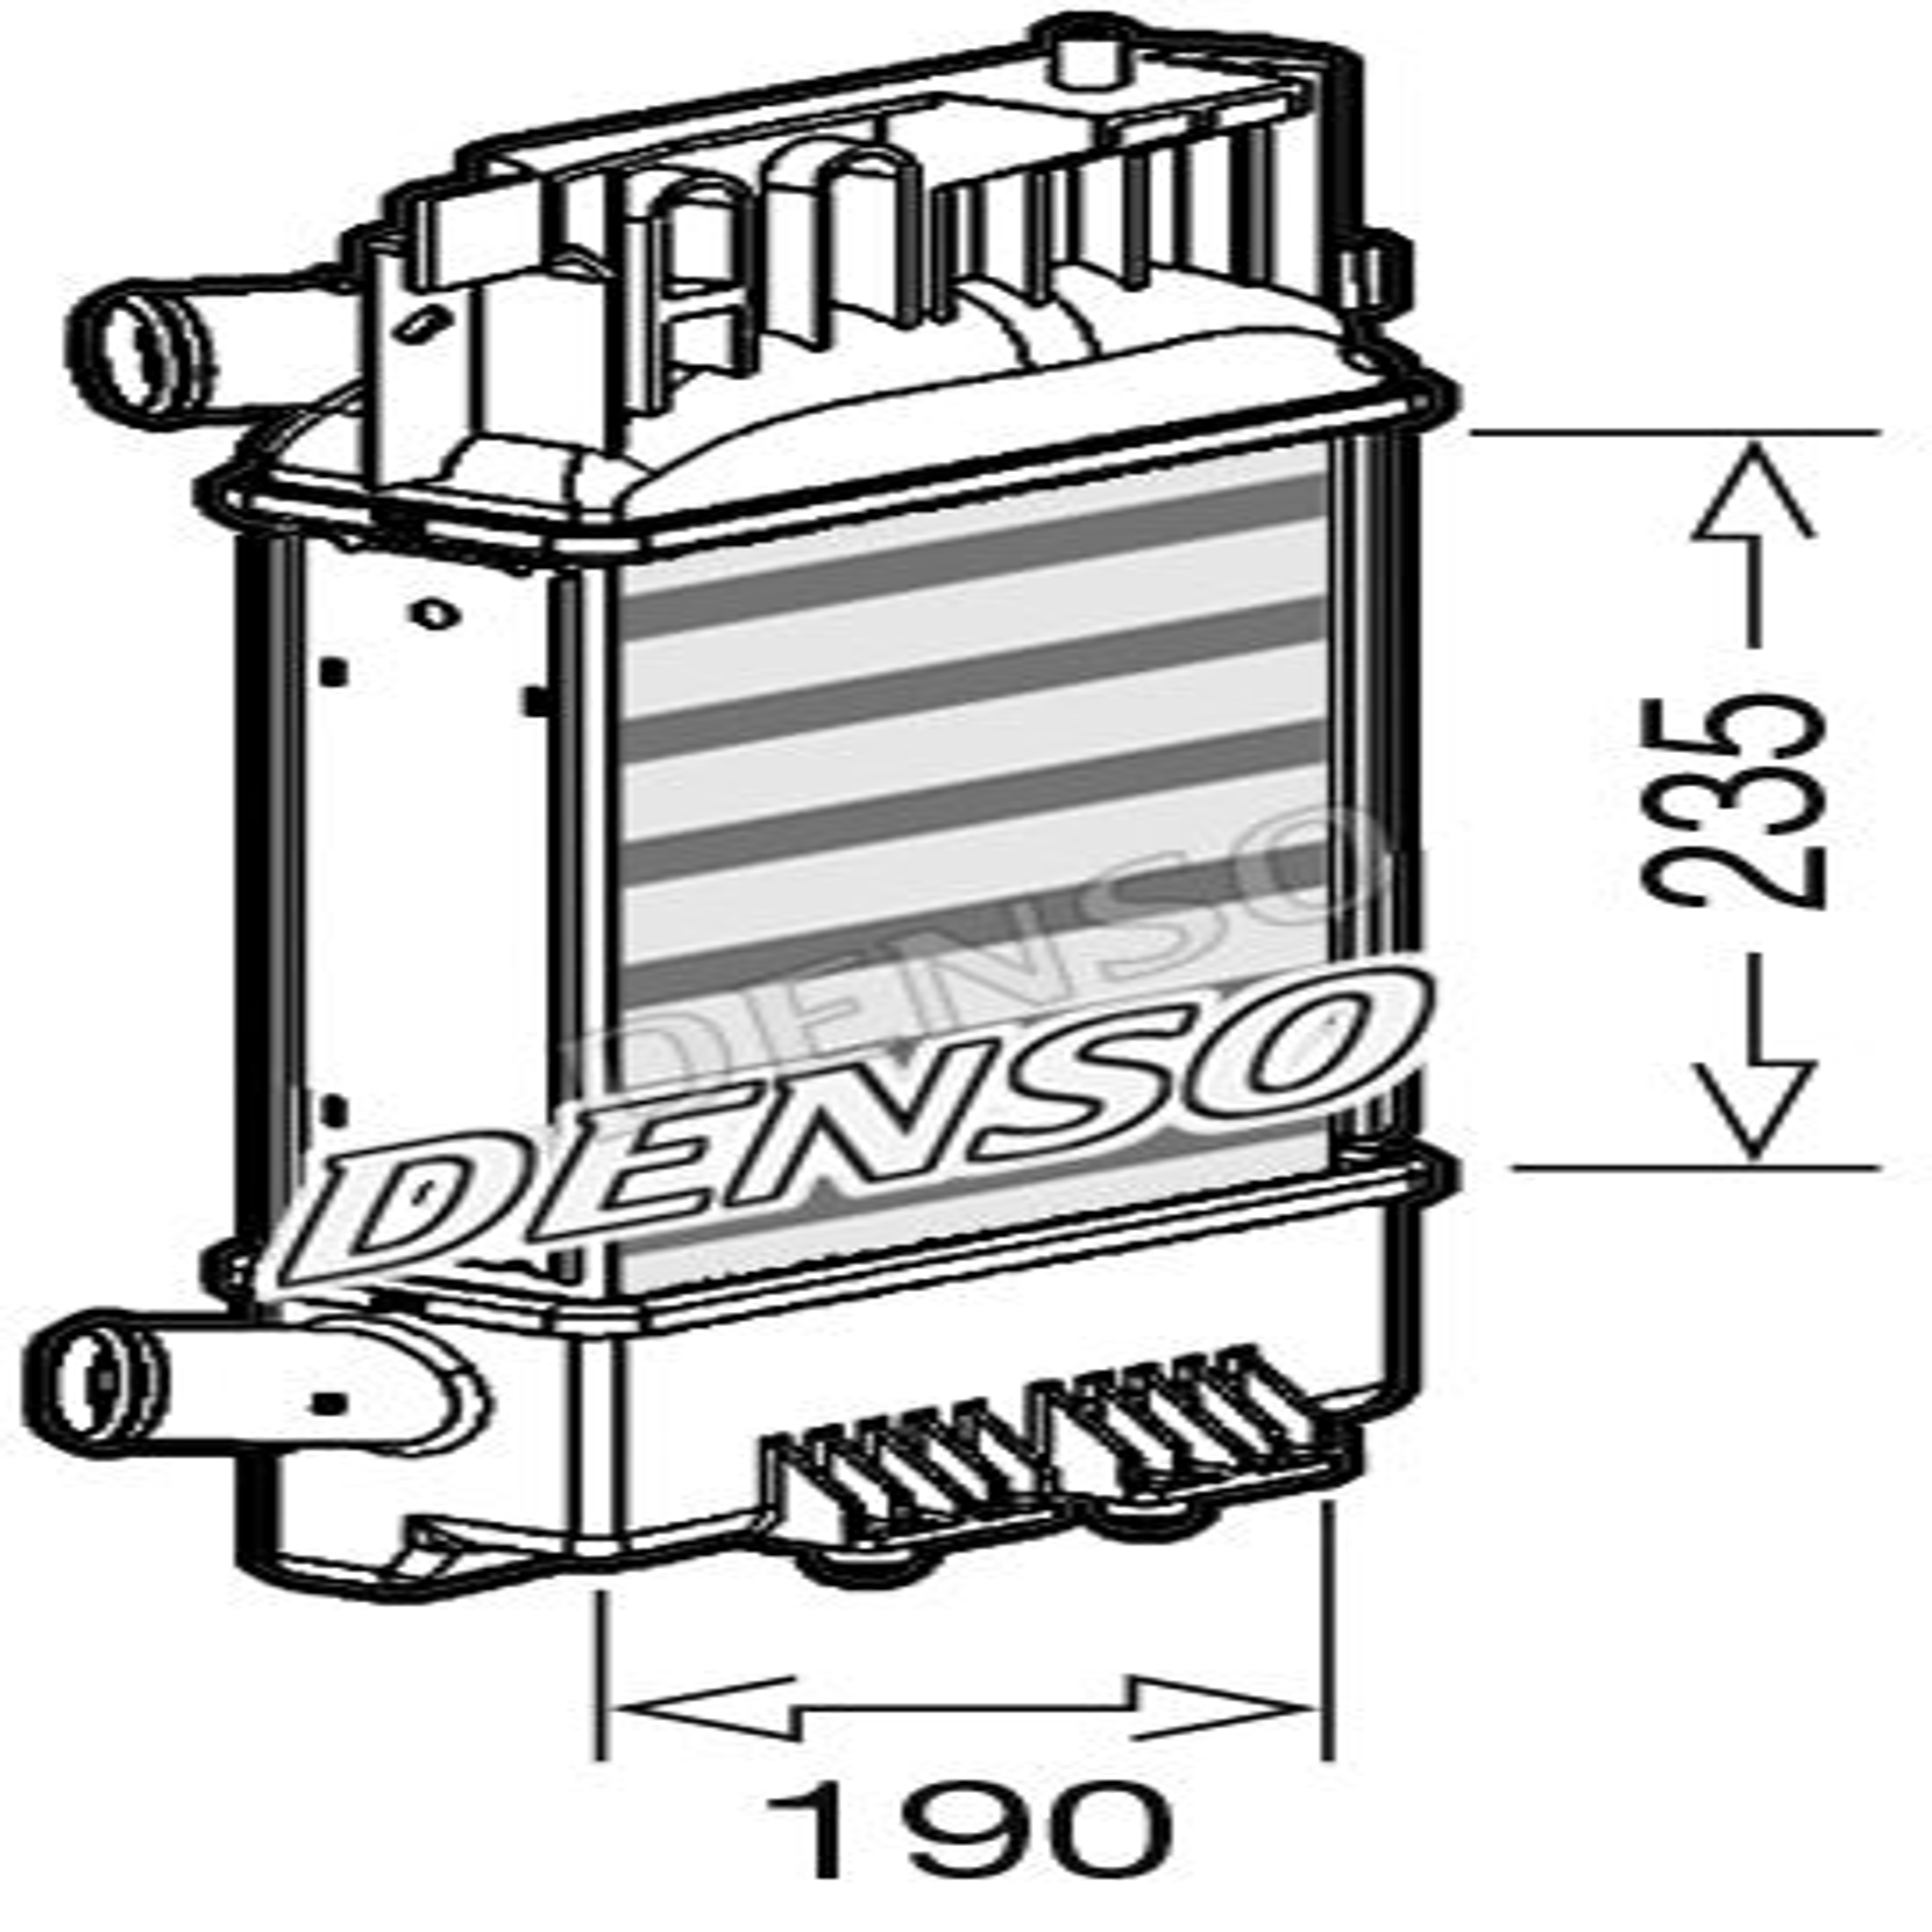 Buy original Exhaust DENSO DOX-0262